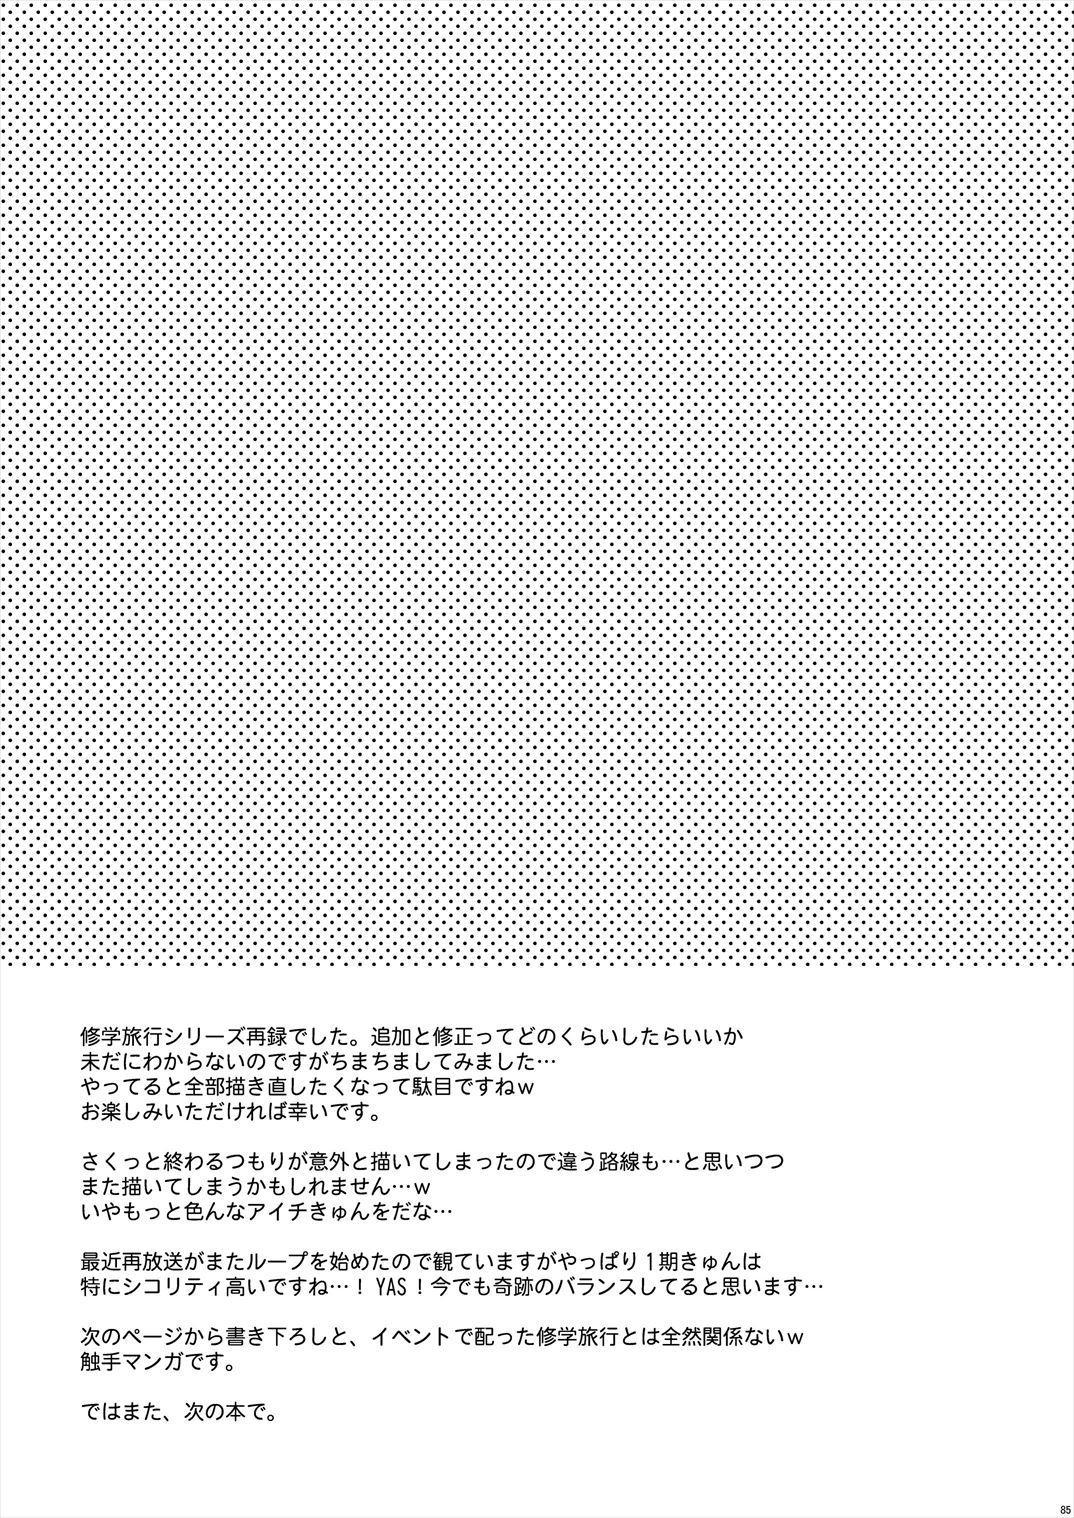 Ecchi de Bitch na Aichi-kyun Log 2 84